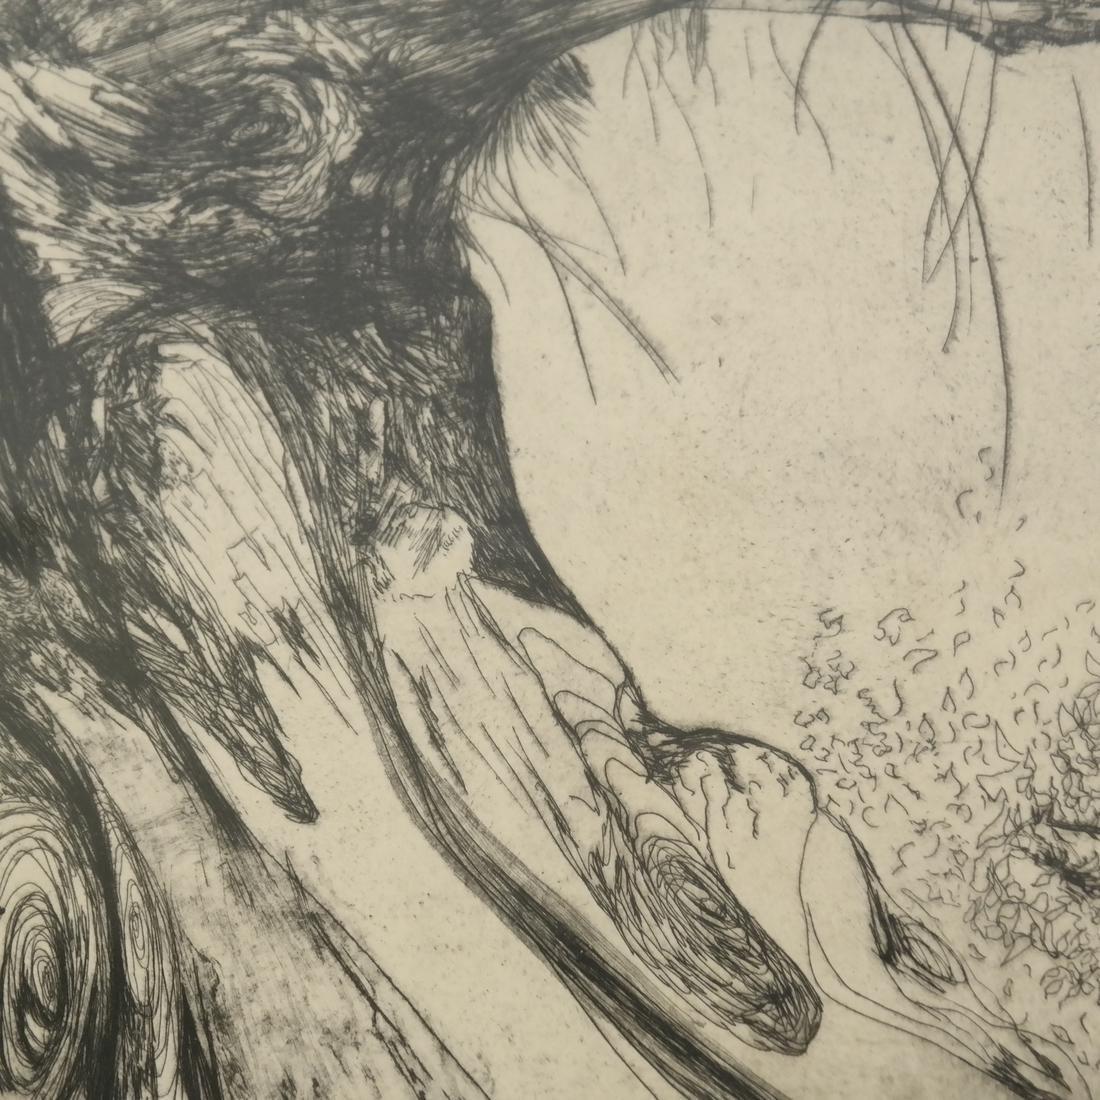 Helen Fesenmaier - Landscape - Etching - 5